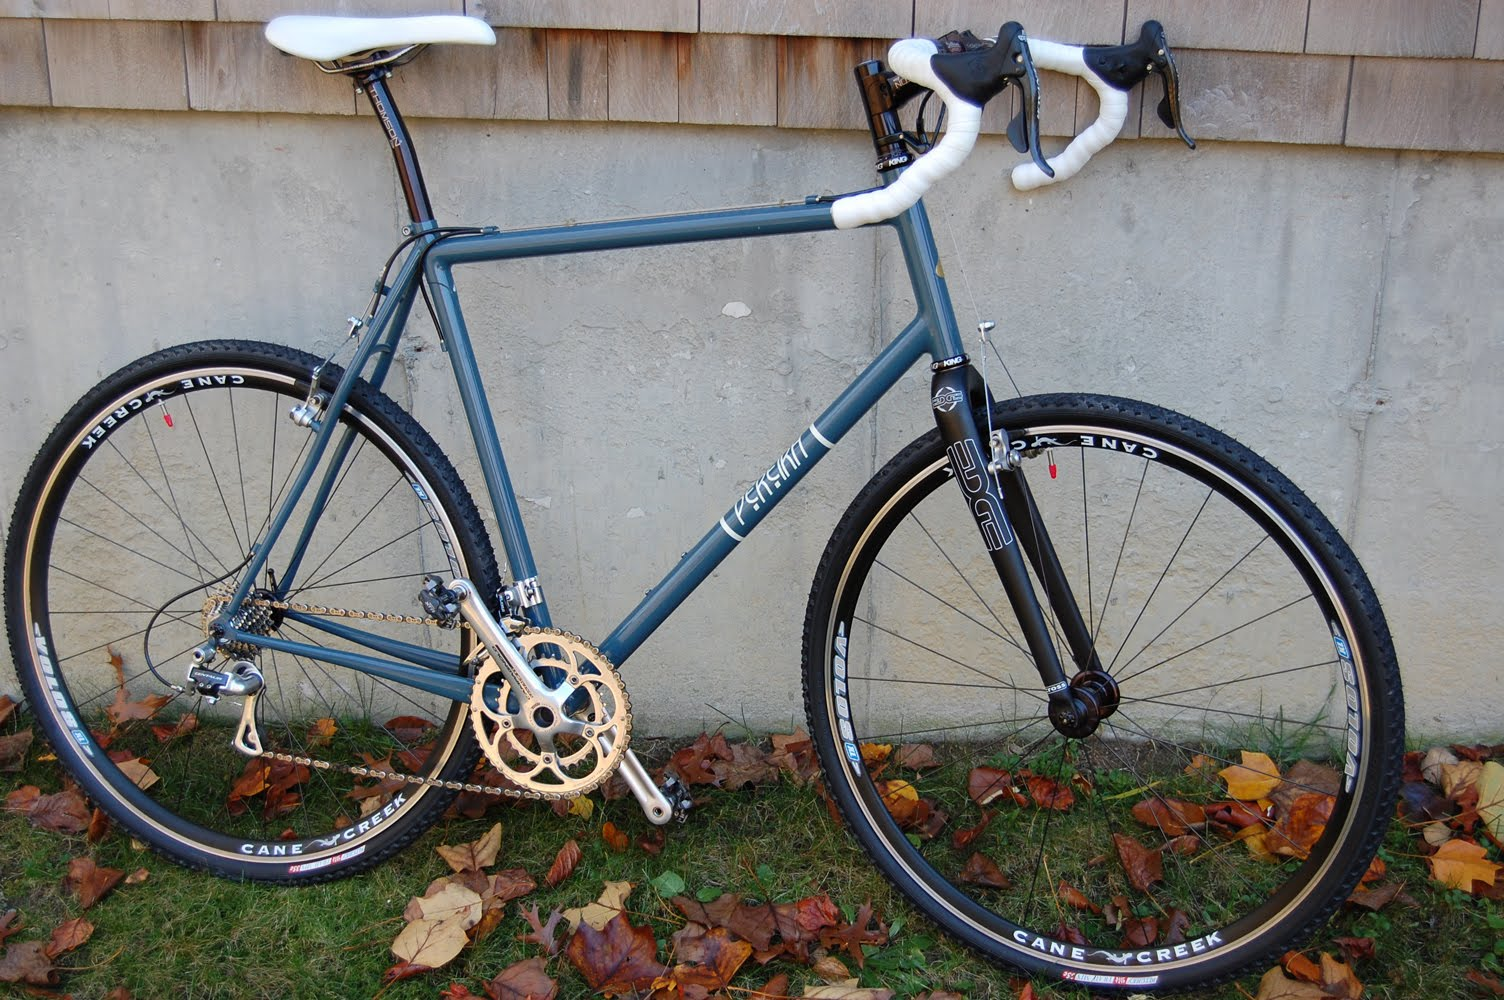 Plus One Lap Handmade Cyclocross Bike Greg S Pereira